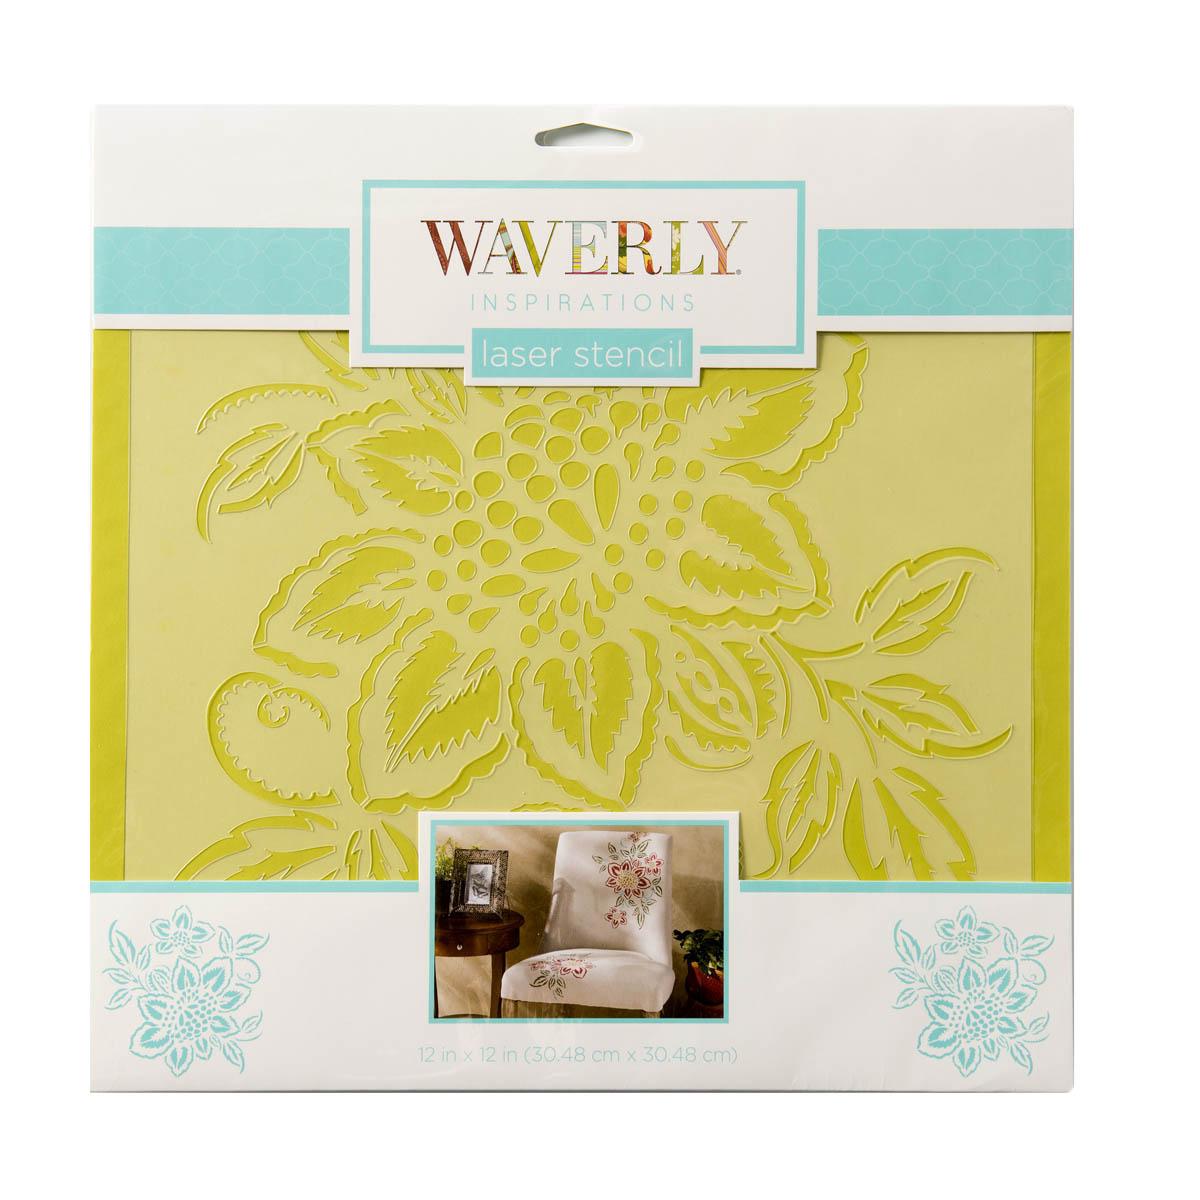 Waverly ® Inspirations Laser Stencils - Décor - Floral, 12